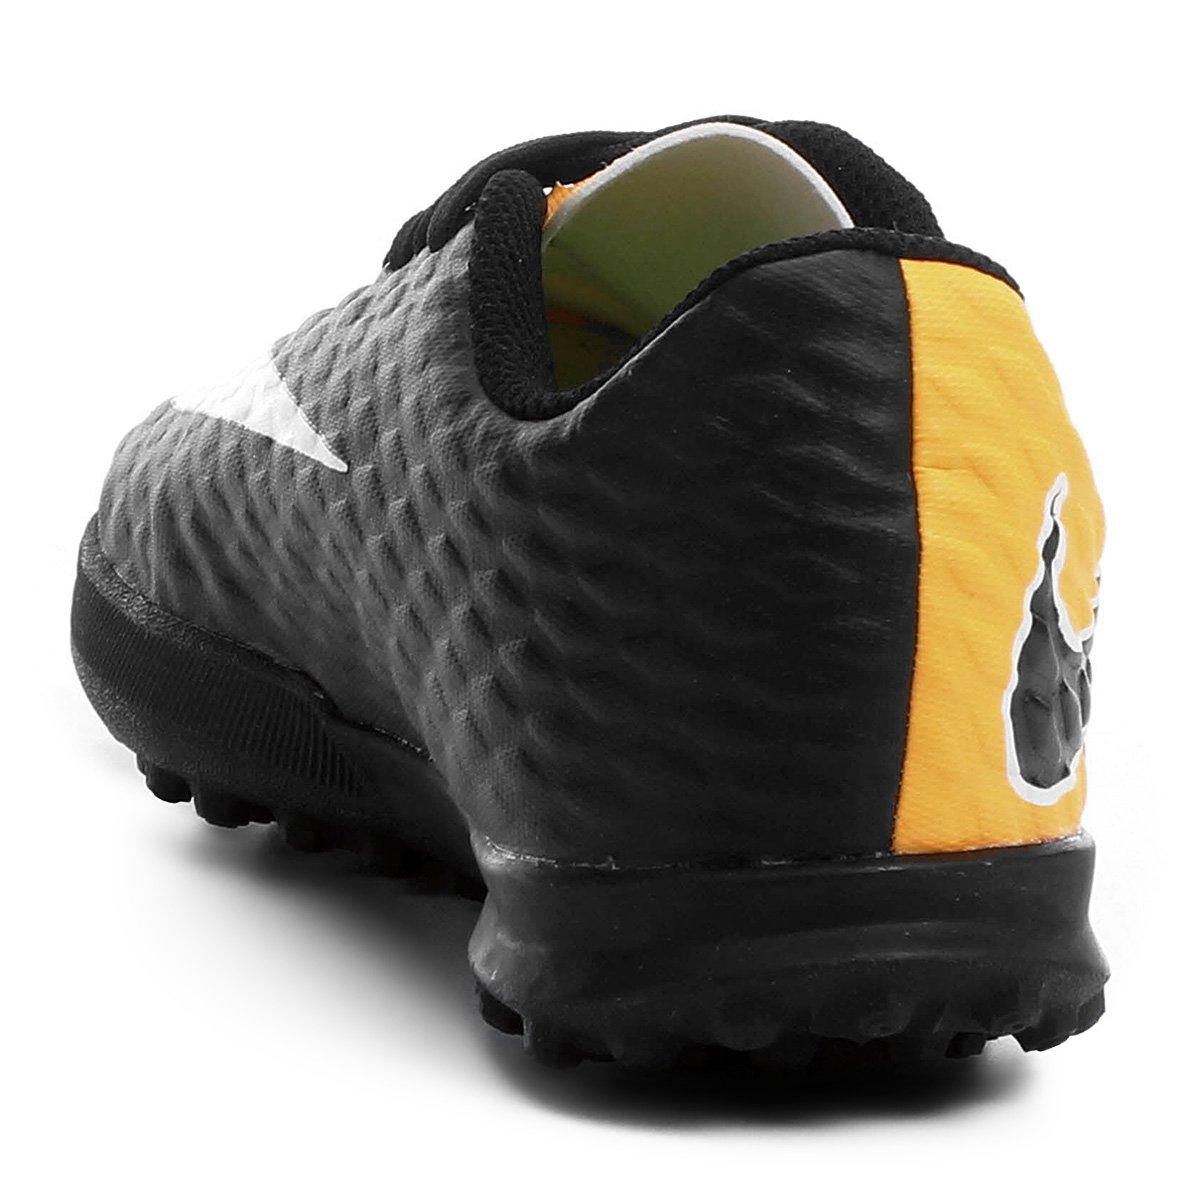 Chuteira Society Infantil Nike Hypervenom Phade 3 TF - Compre Agora ... 198486e1cd620